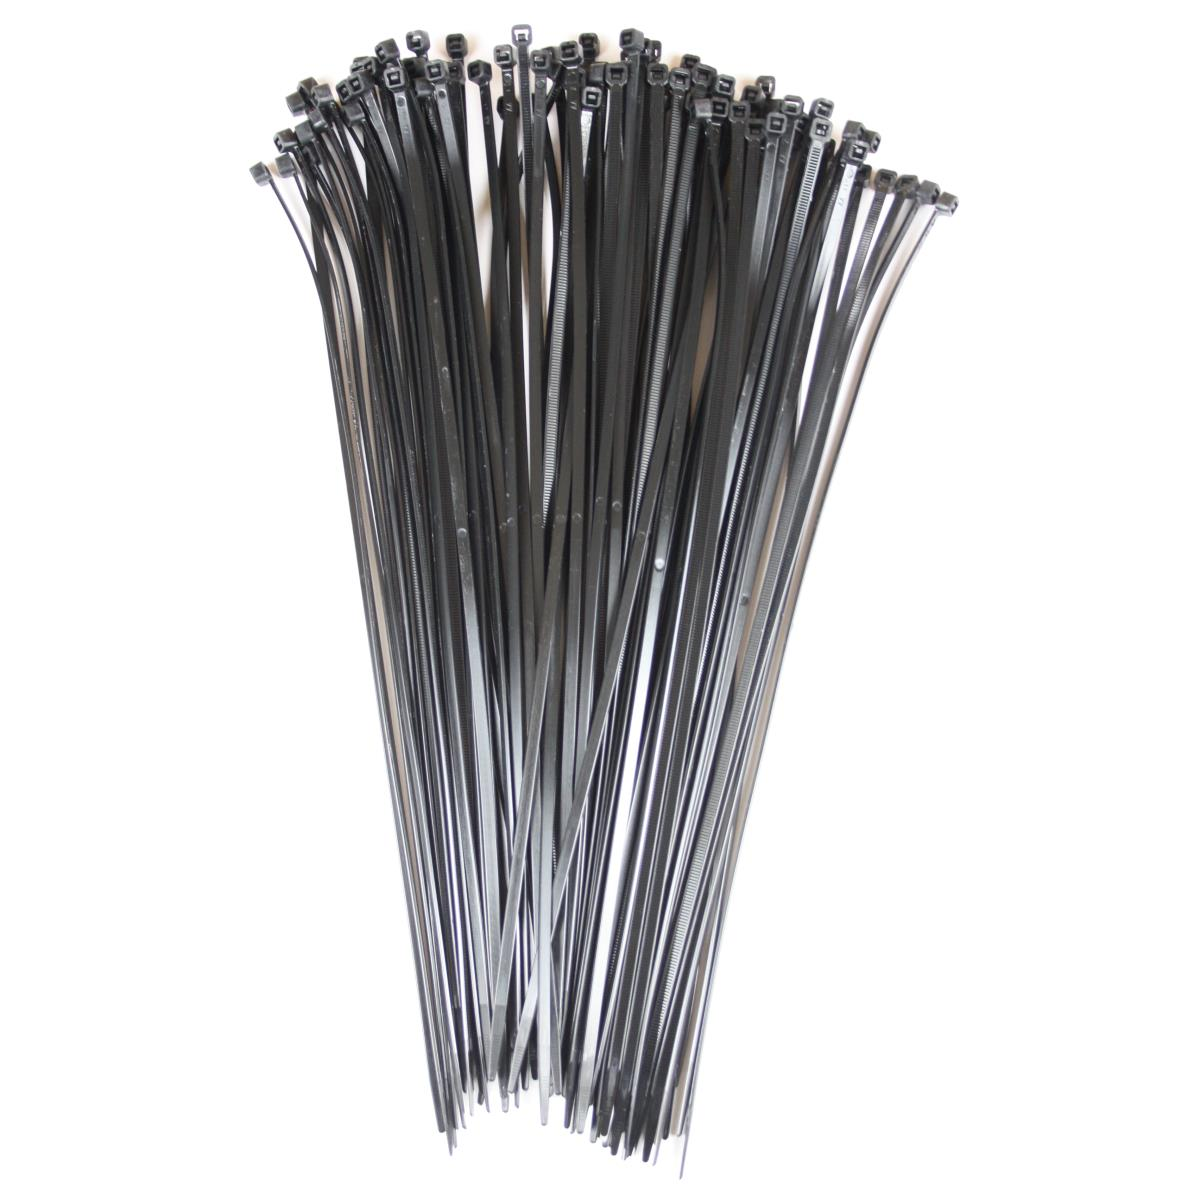 Kabelbinder 1000 Stück schwarz 2,5 x 100 mm,Elektro-Plast,WI008017, 0721947481911